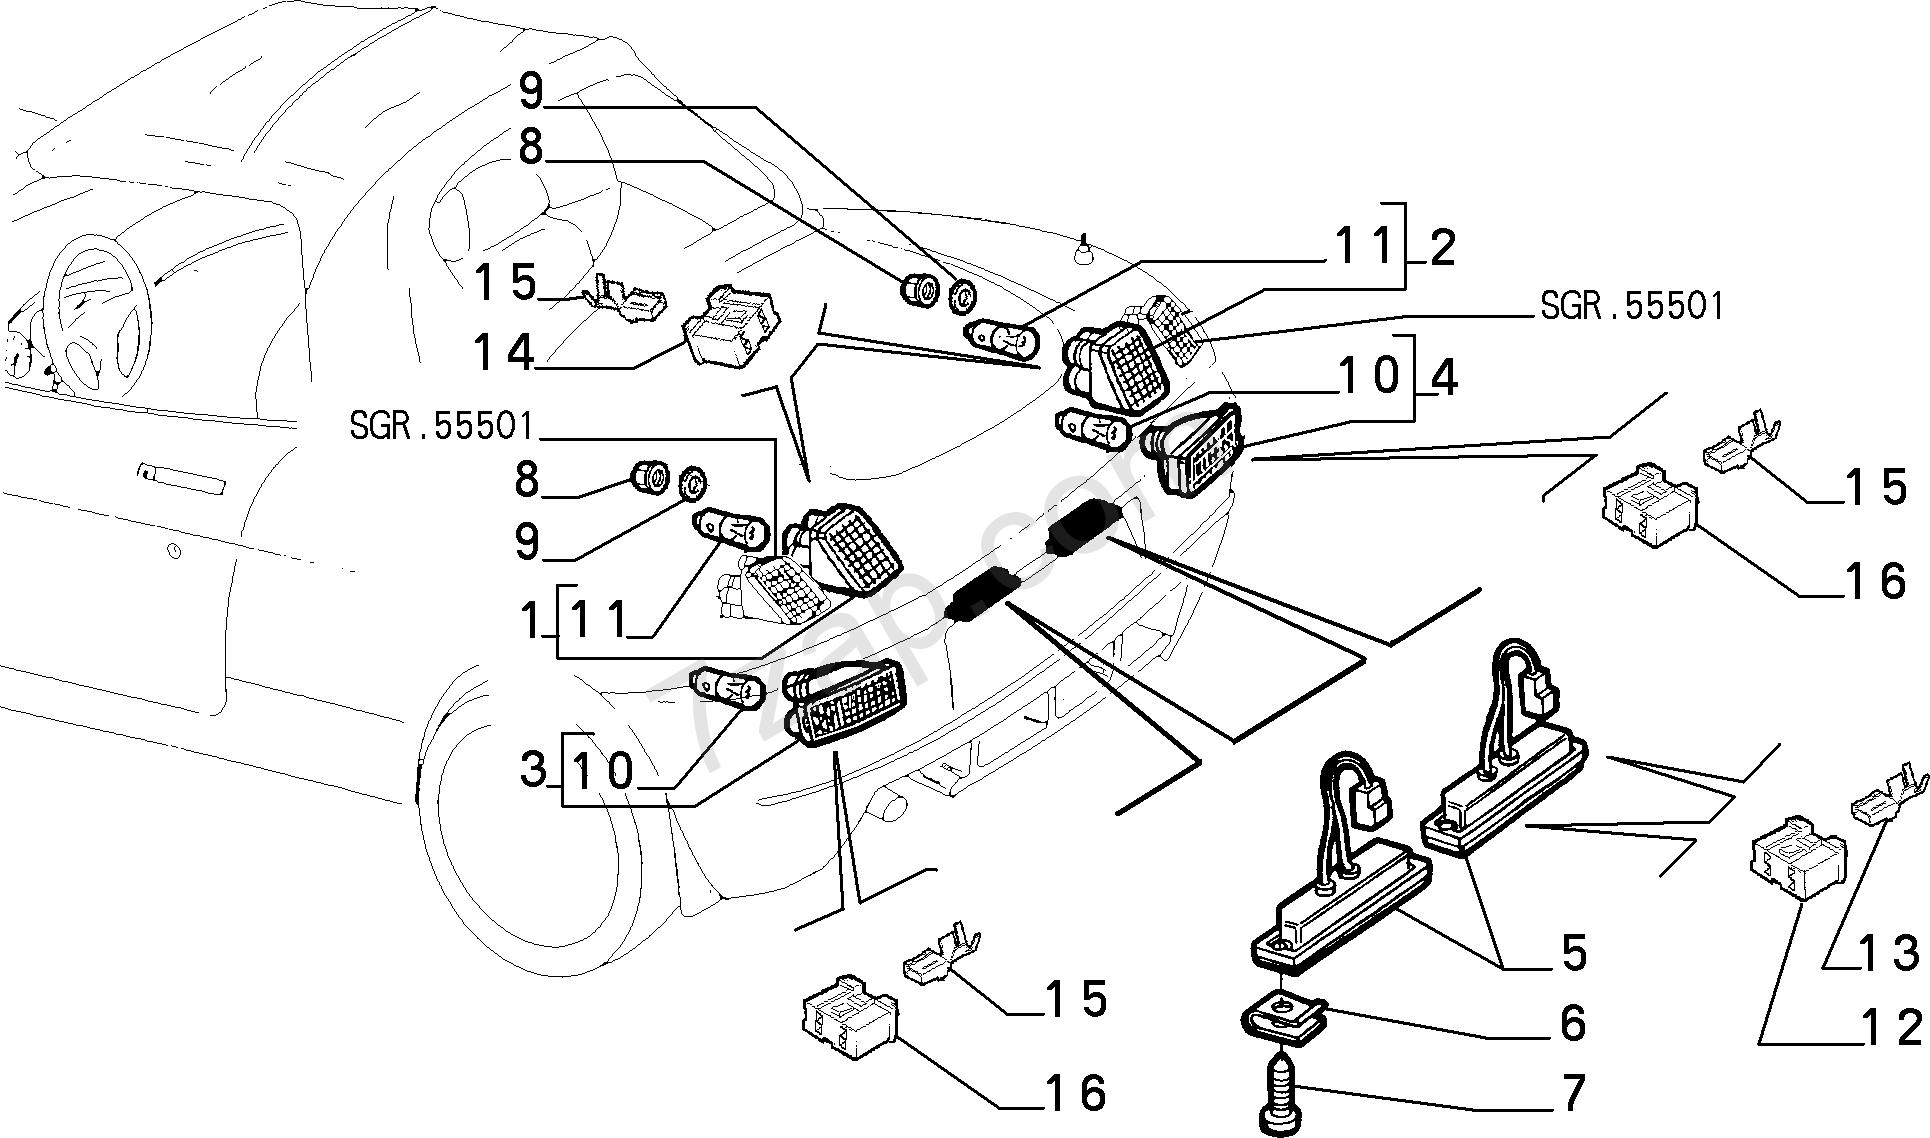 Miraculous Wrg 1178 Fiat Barchetta Wiring Diagram Wiring Cloud Licukaidewilluminateatxorg